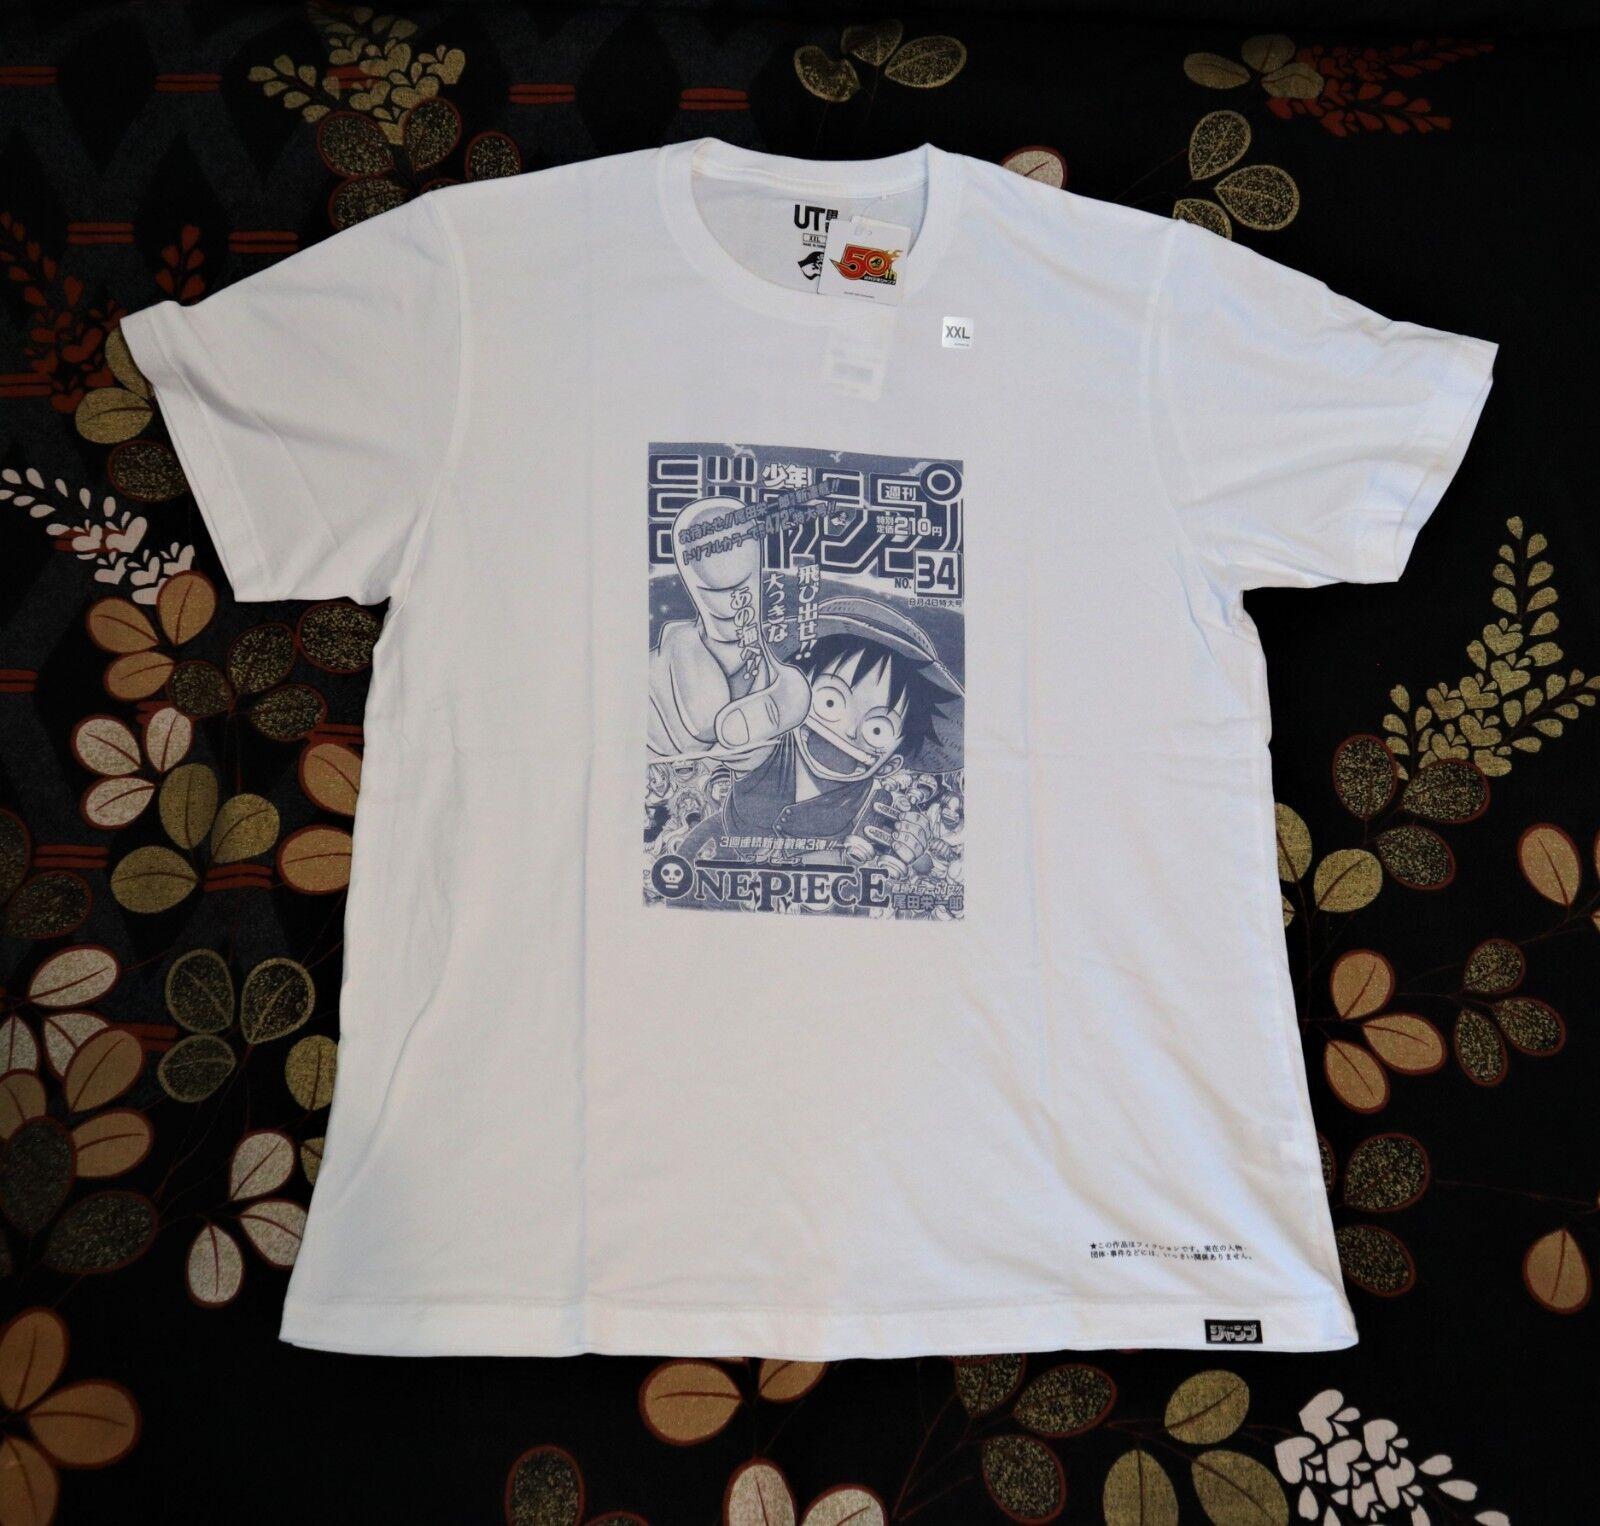 ONE PIECE X UNIQLO Shonen Jump Graphic Tee shirt 50th COMIC COVER  S ,M ,L, XL